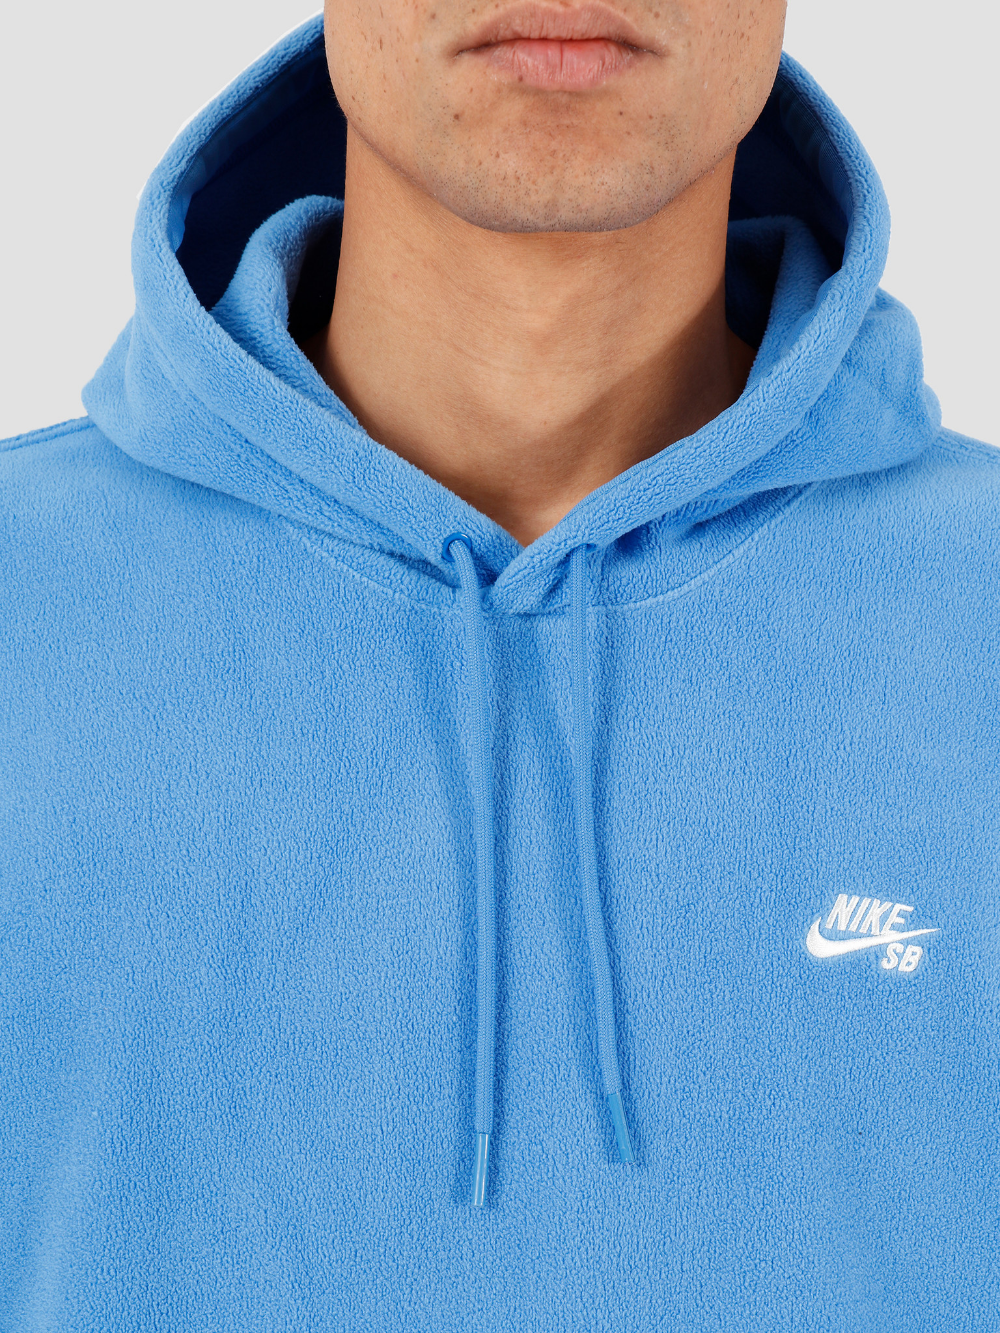 Predownload: Nike Sb Hoodie Pacific Blue Sail Ci0936 402 Freshcotton Pacific Blue Nike Sb Hoodies [ 1333 x 1000 Pixel ]